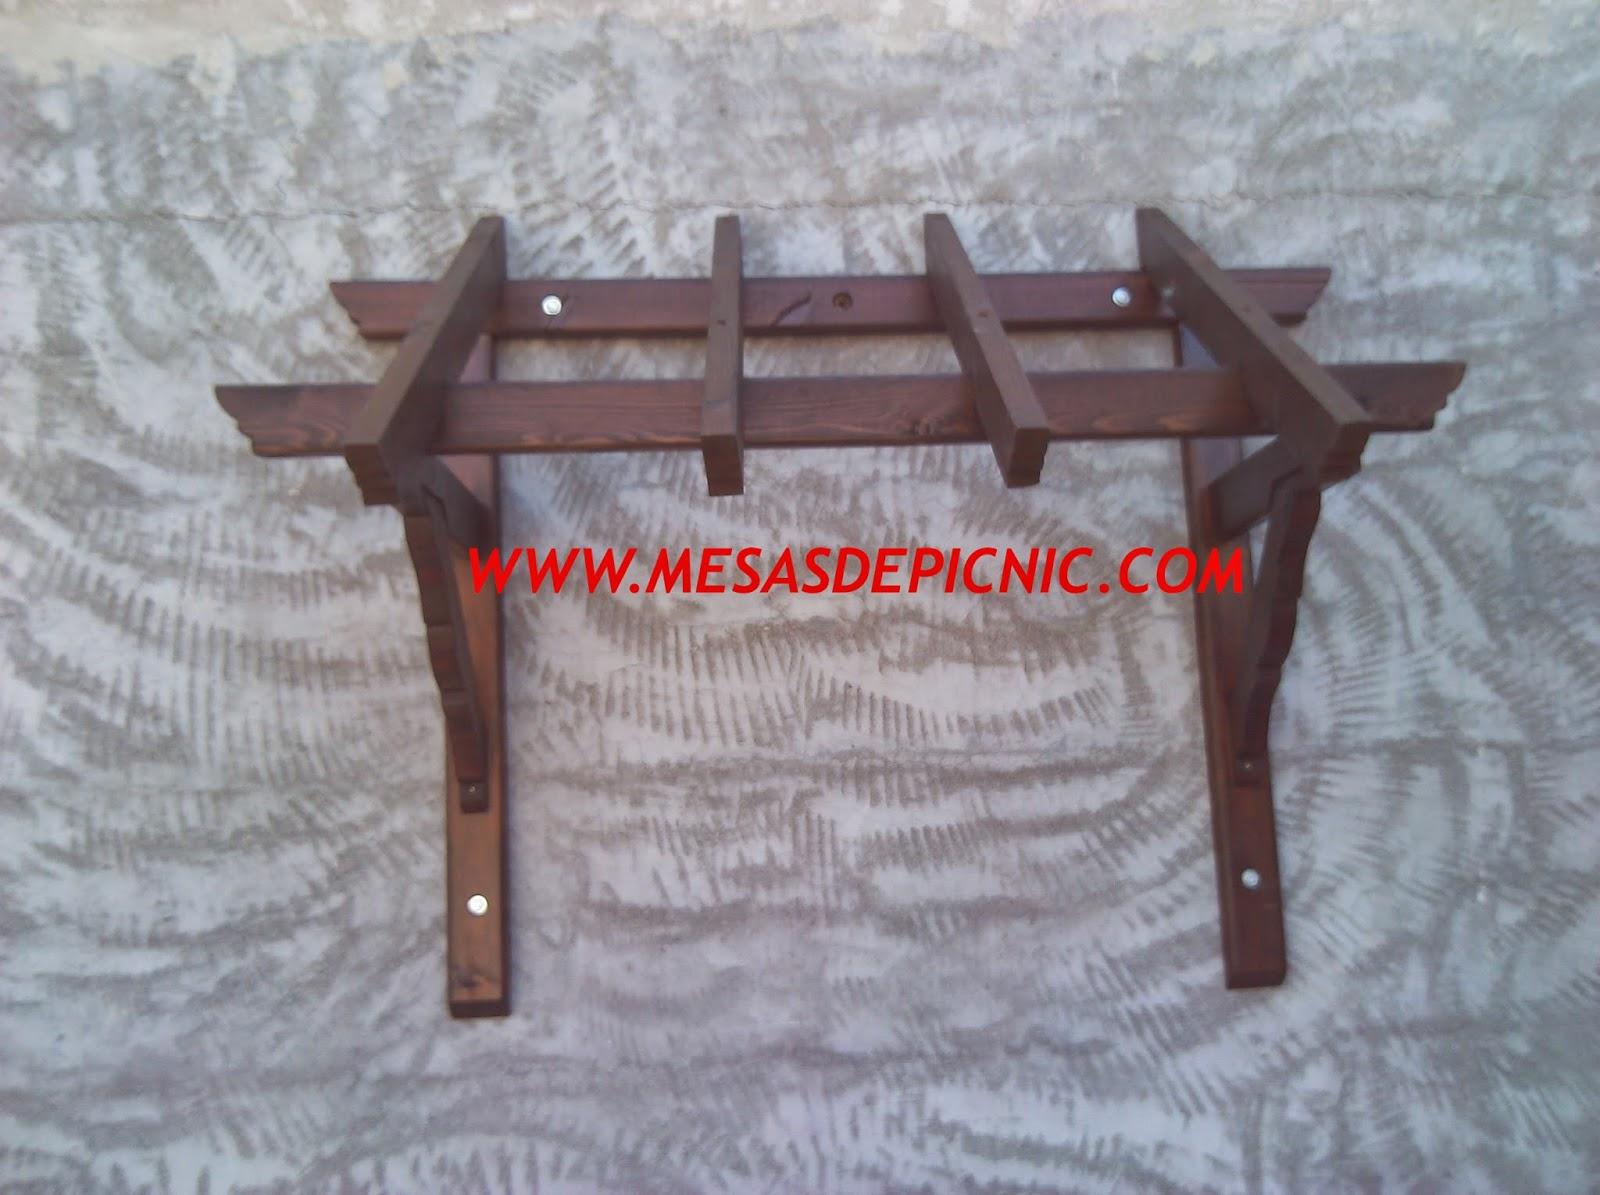 Marquesinas de madera para puertas de entrada cool rustic for Marquesinas para puertas